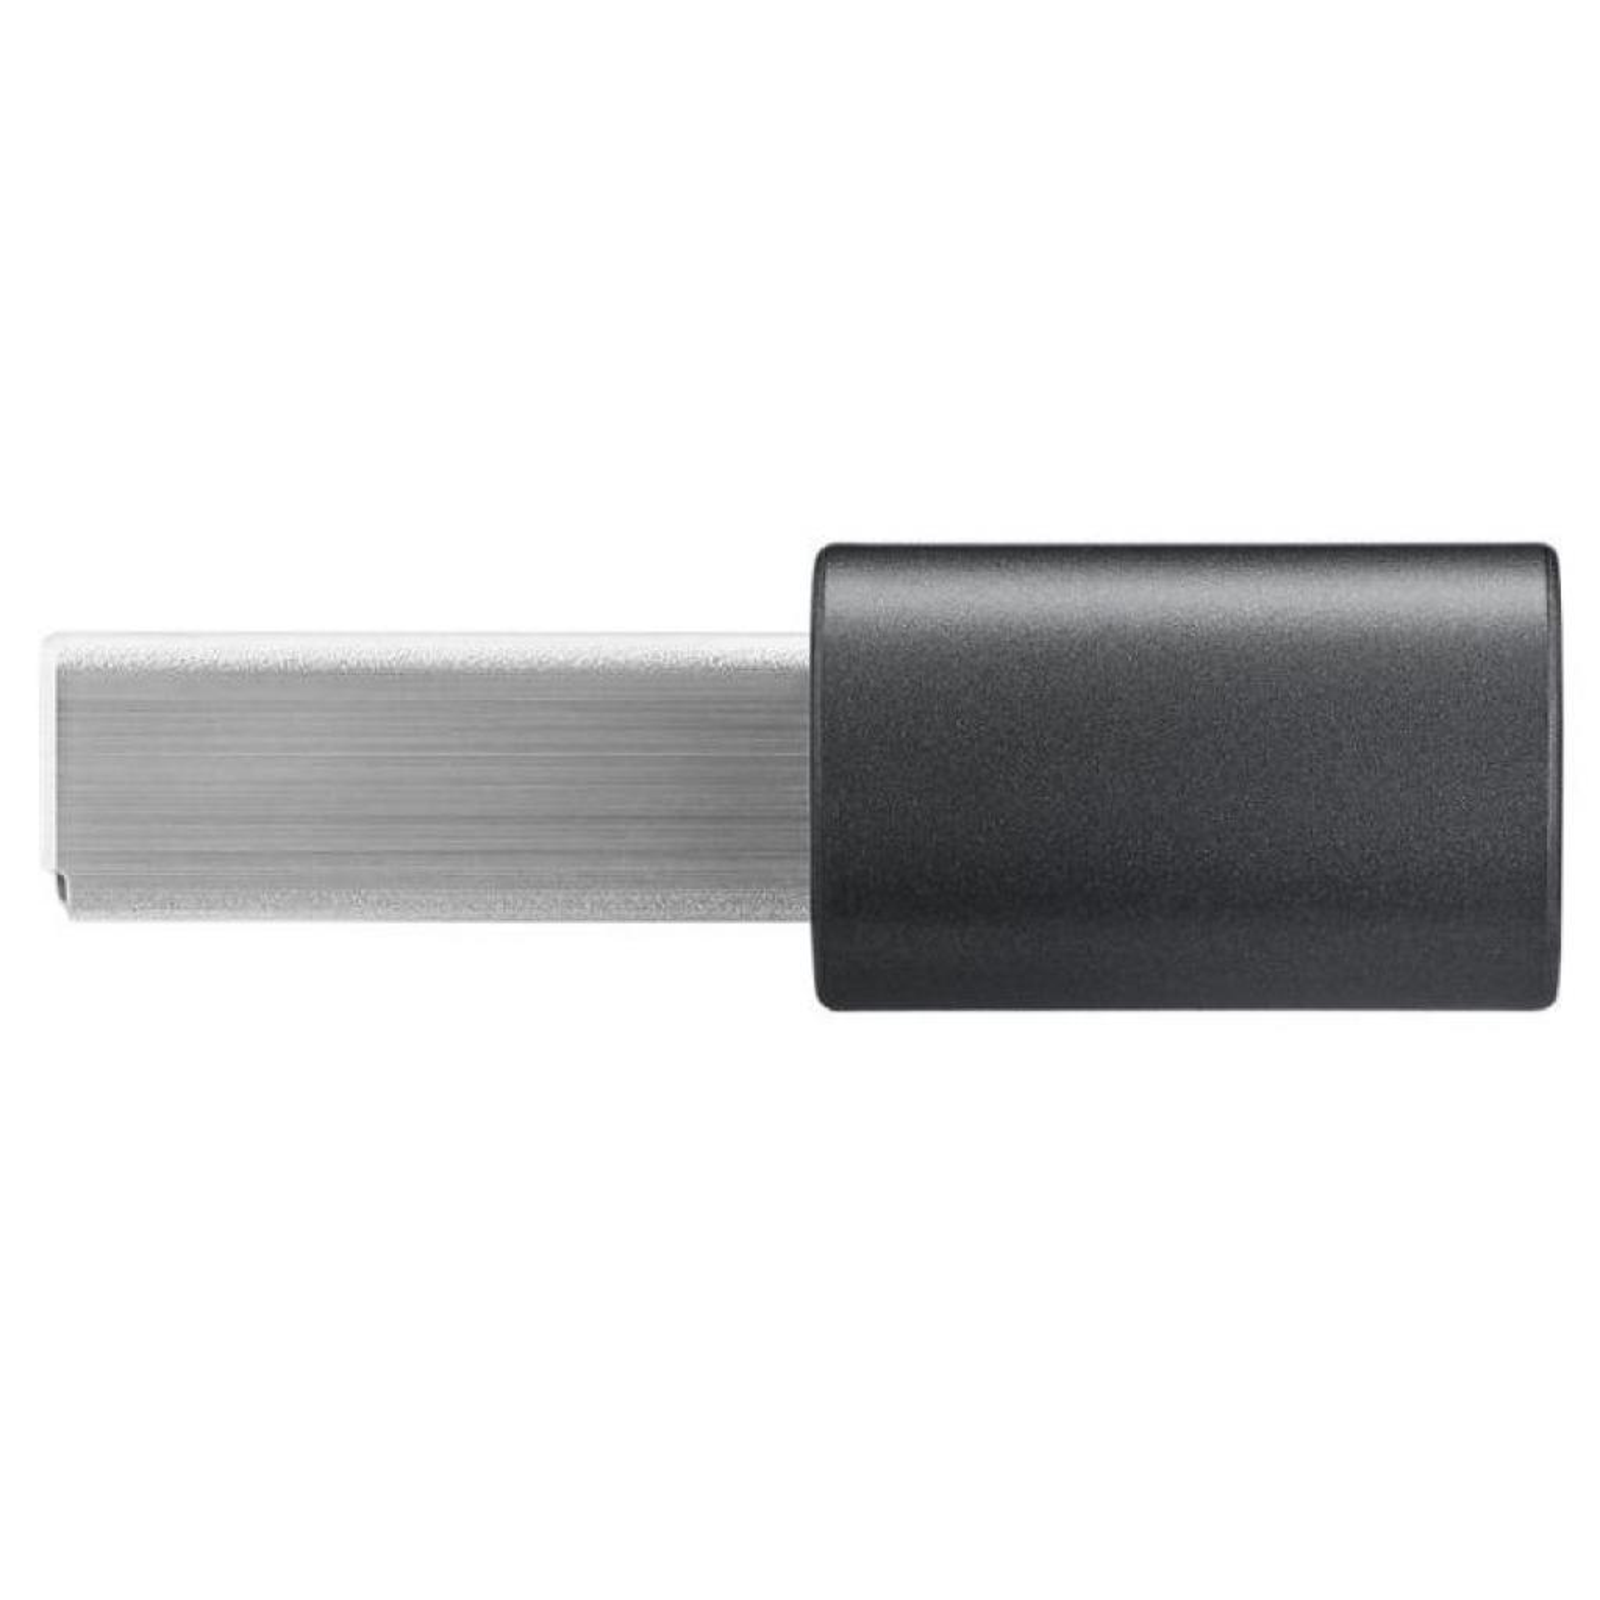 USB флеш накопитель Samsung 64GB Fit Plus USB 3.0 (MUF-64AB/APC) изображение 3